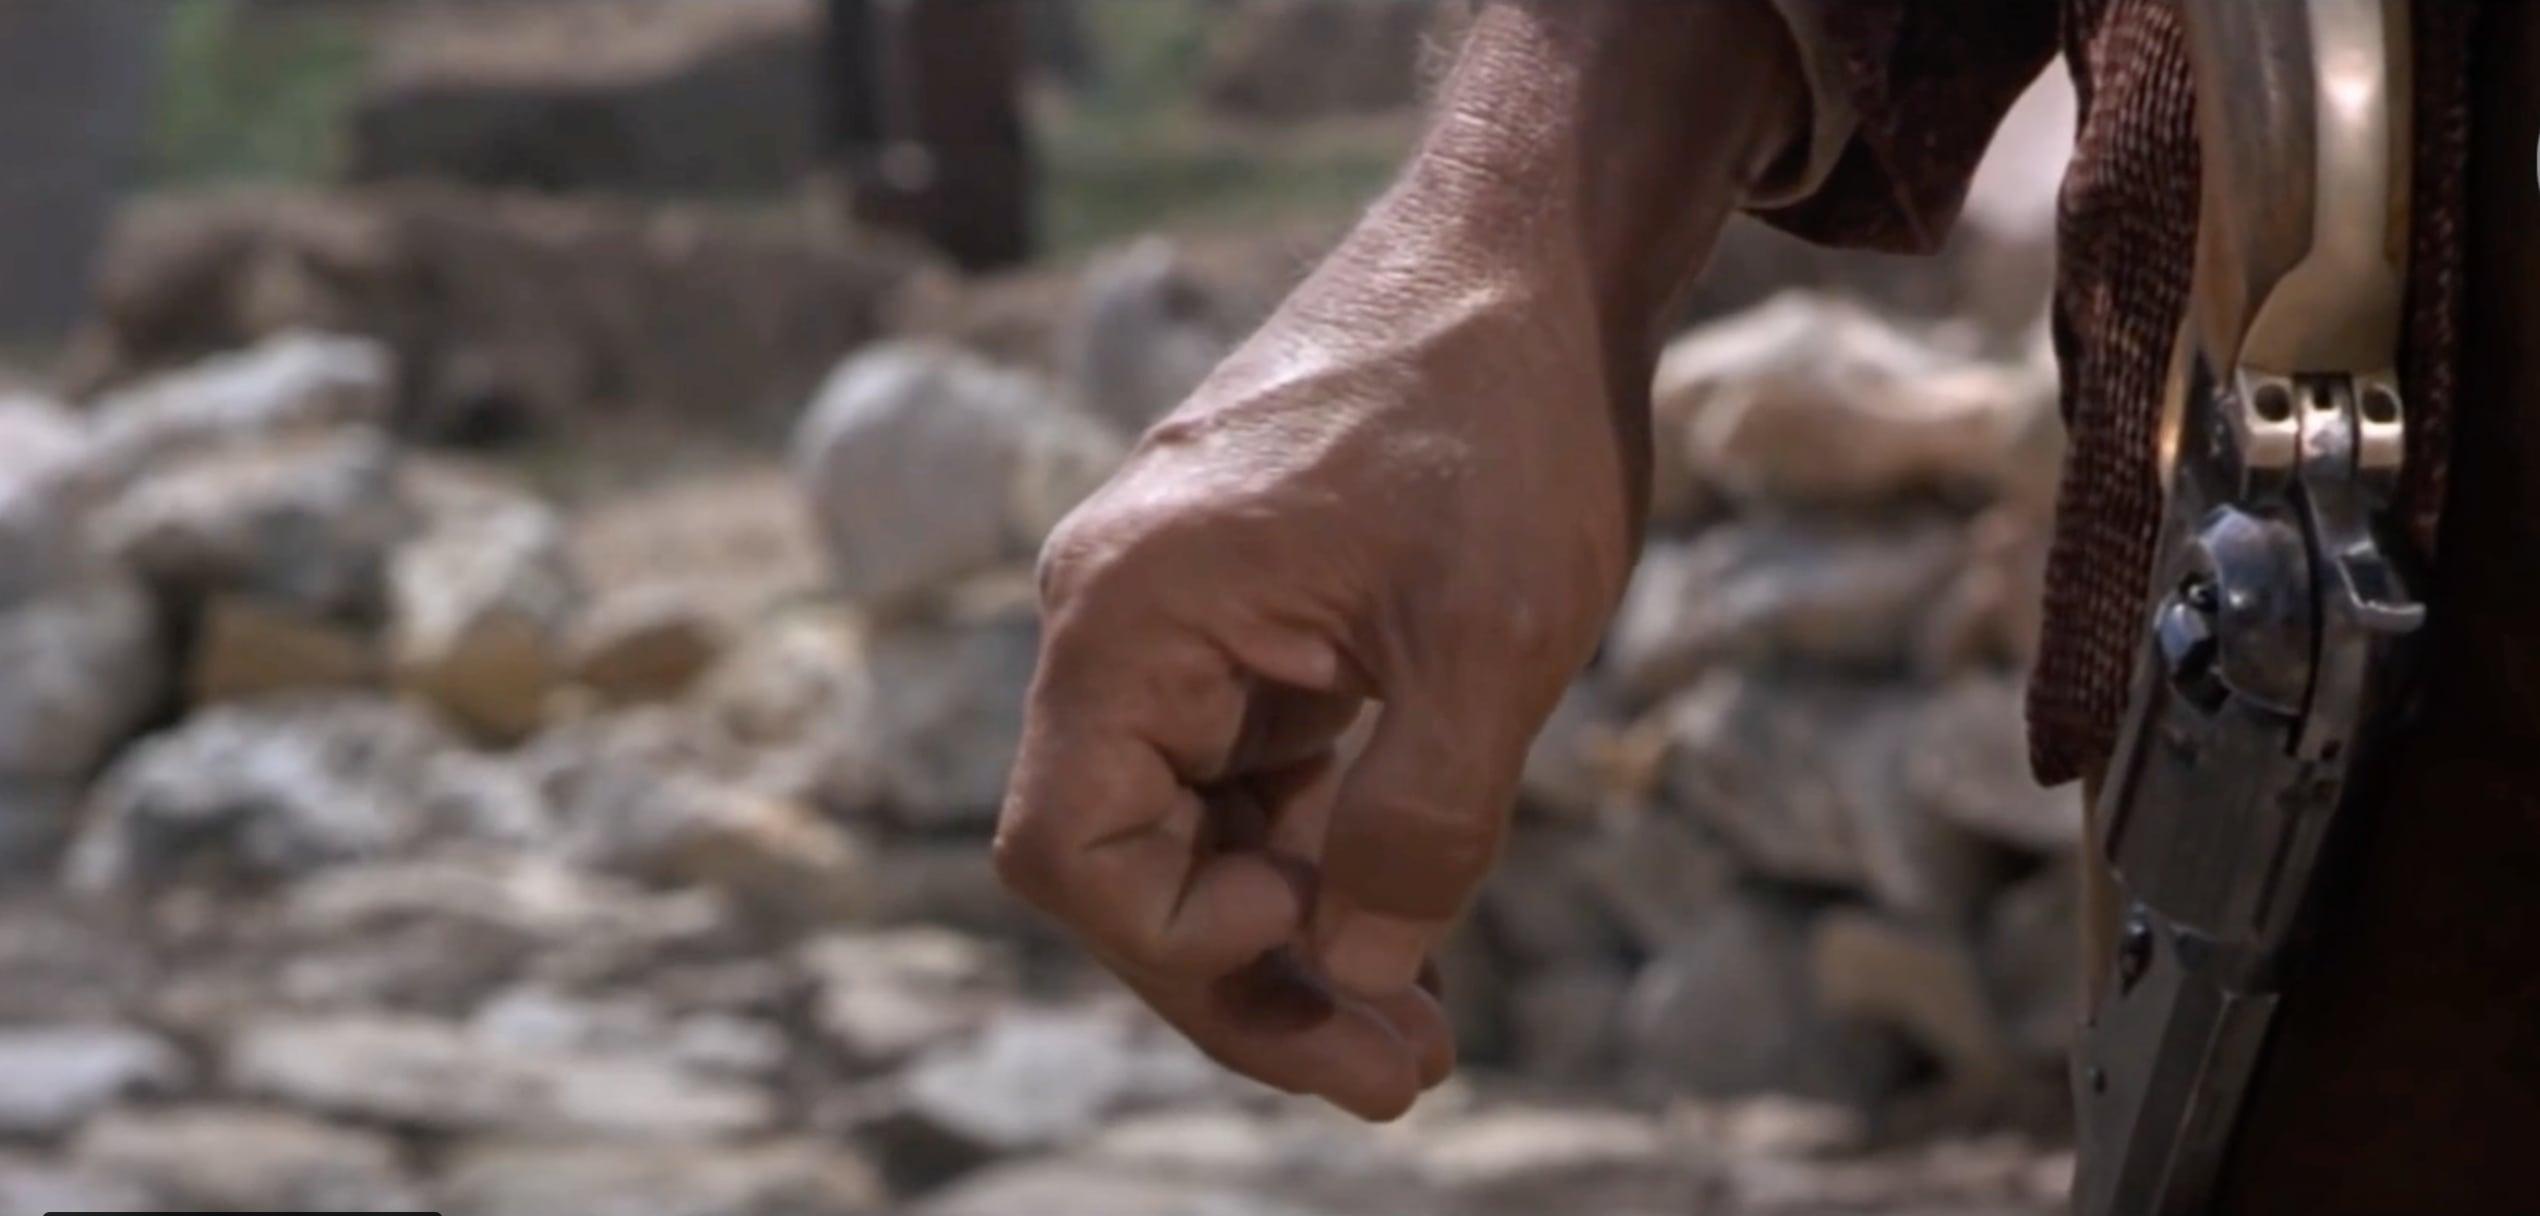 Fra Westernfilm - Hånd Og Pistolbelte